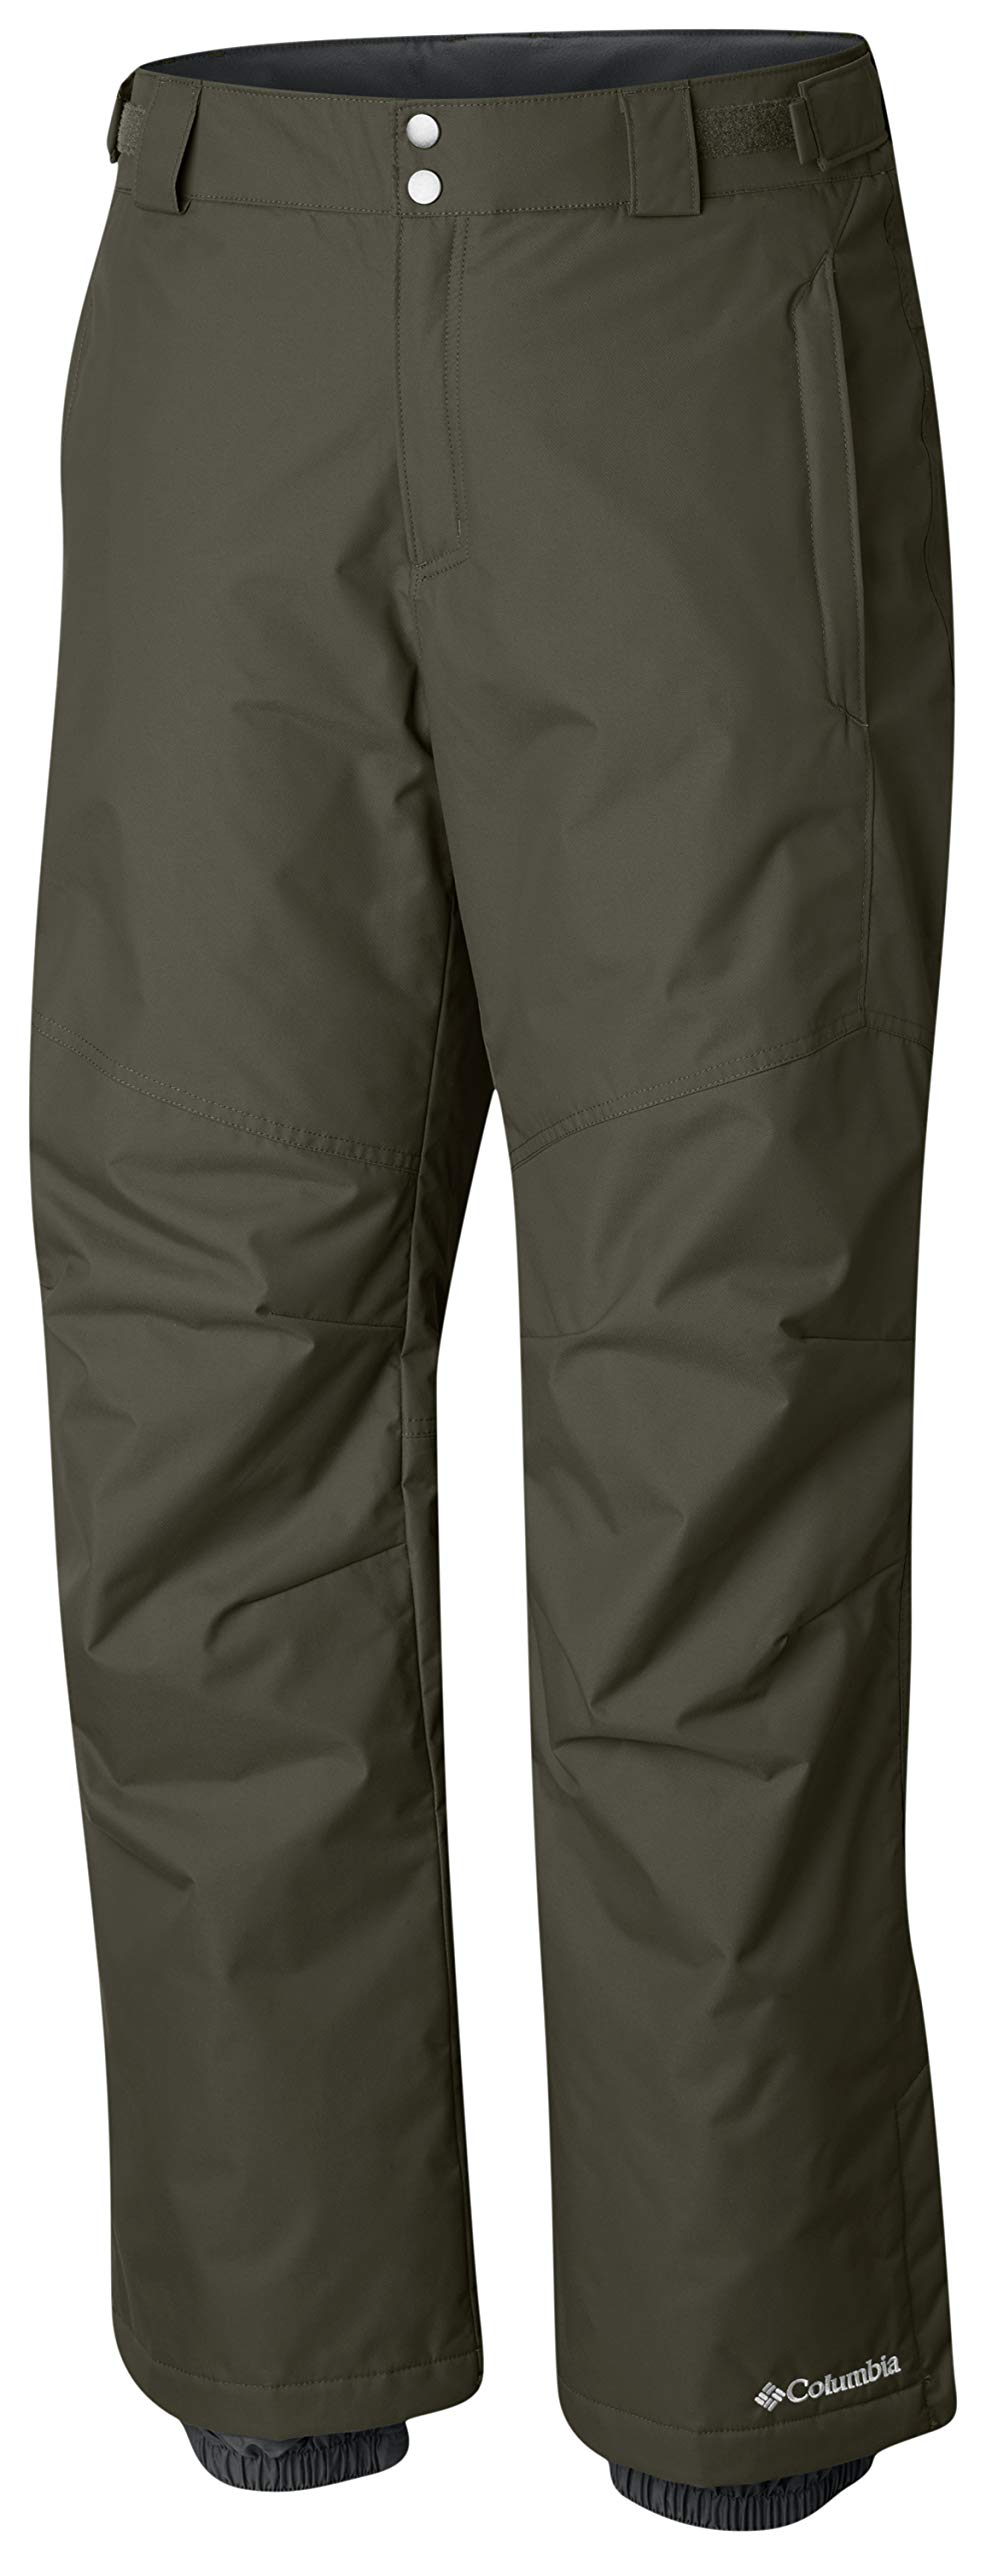 Columbia Men's Bugaboo II Pant, Waterproof and Breathable, Peatmoss, Small x Regular